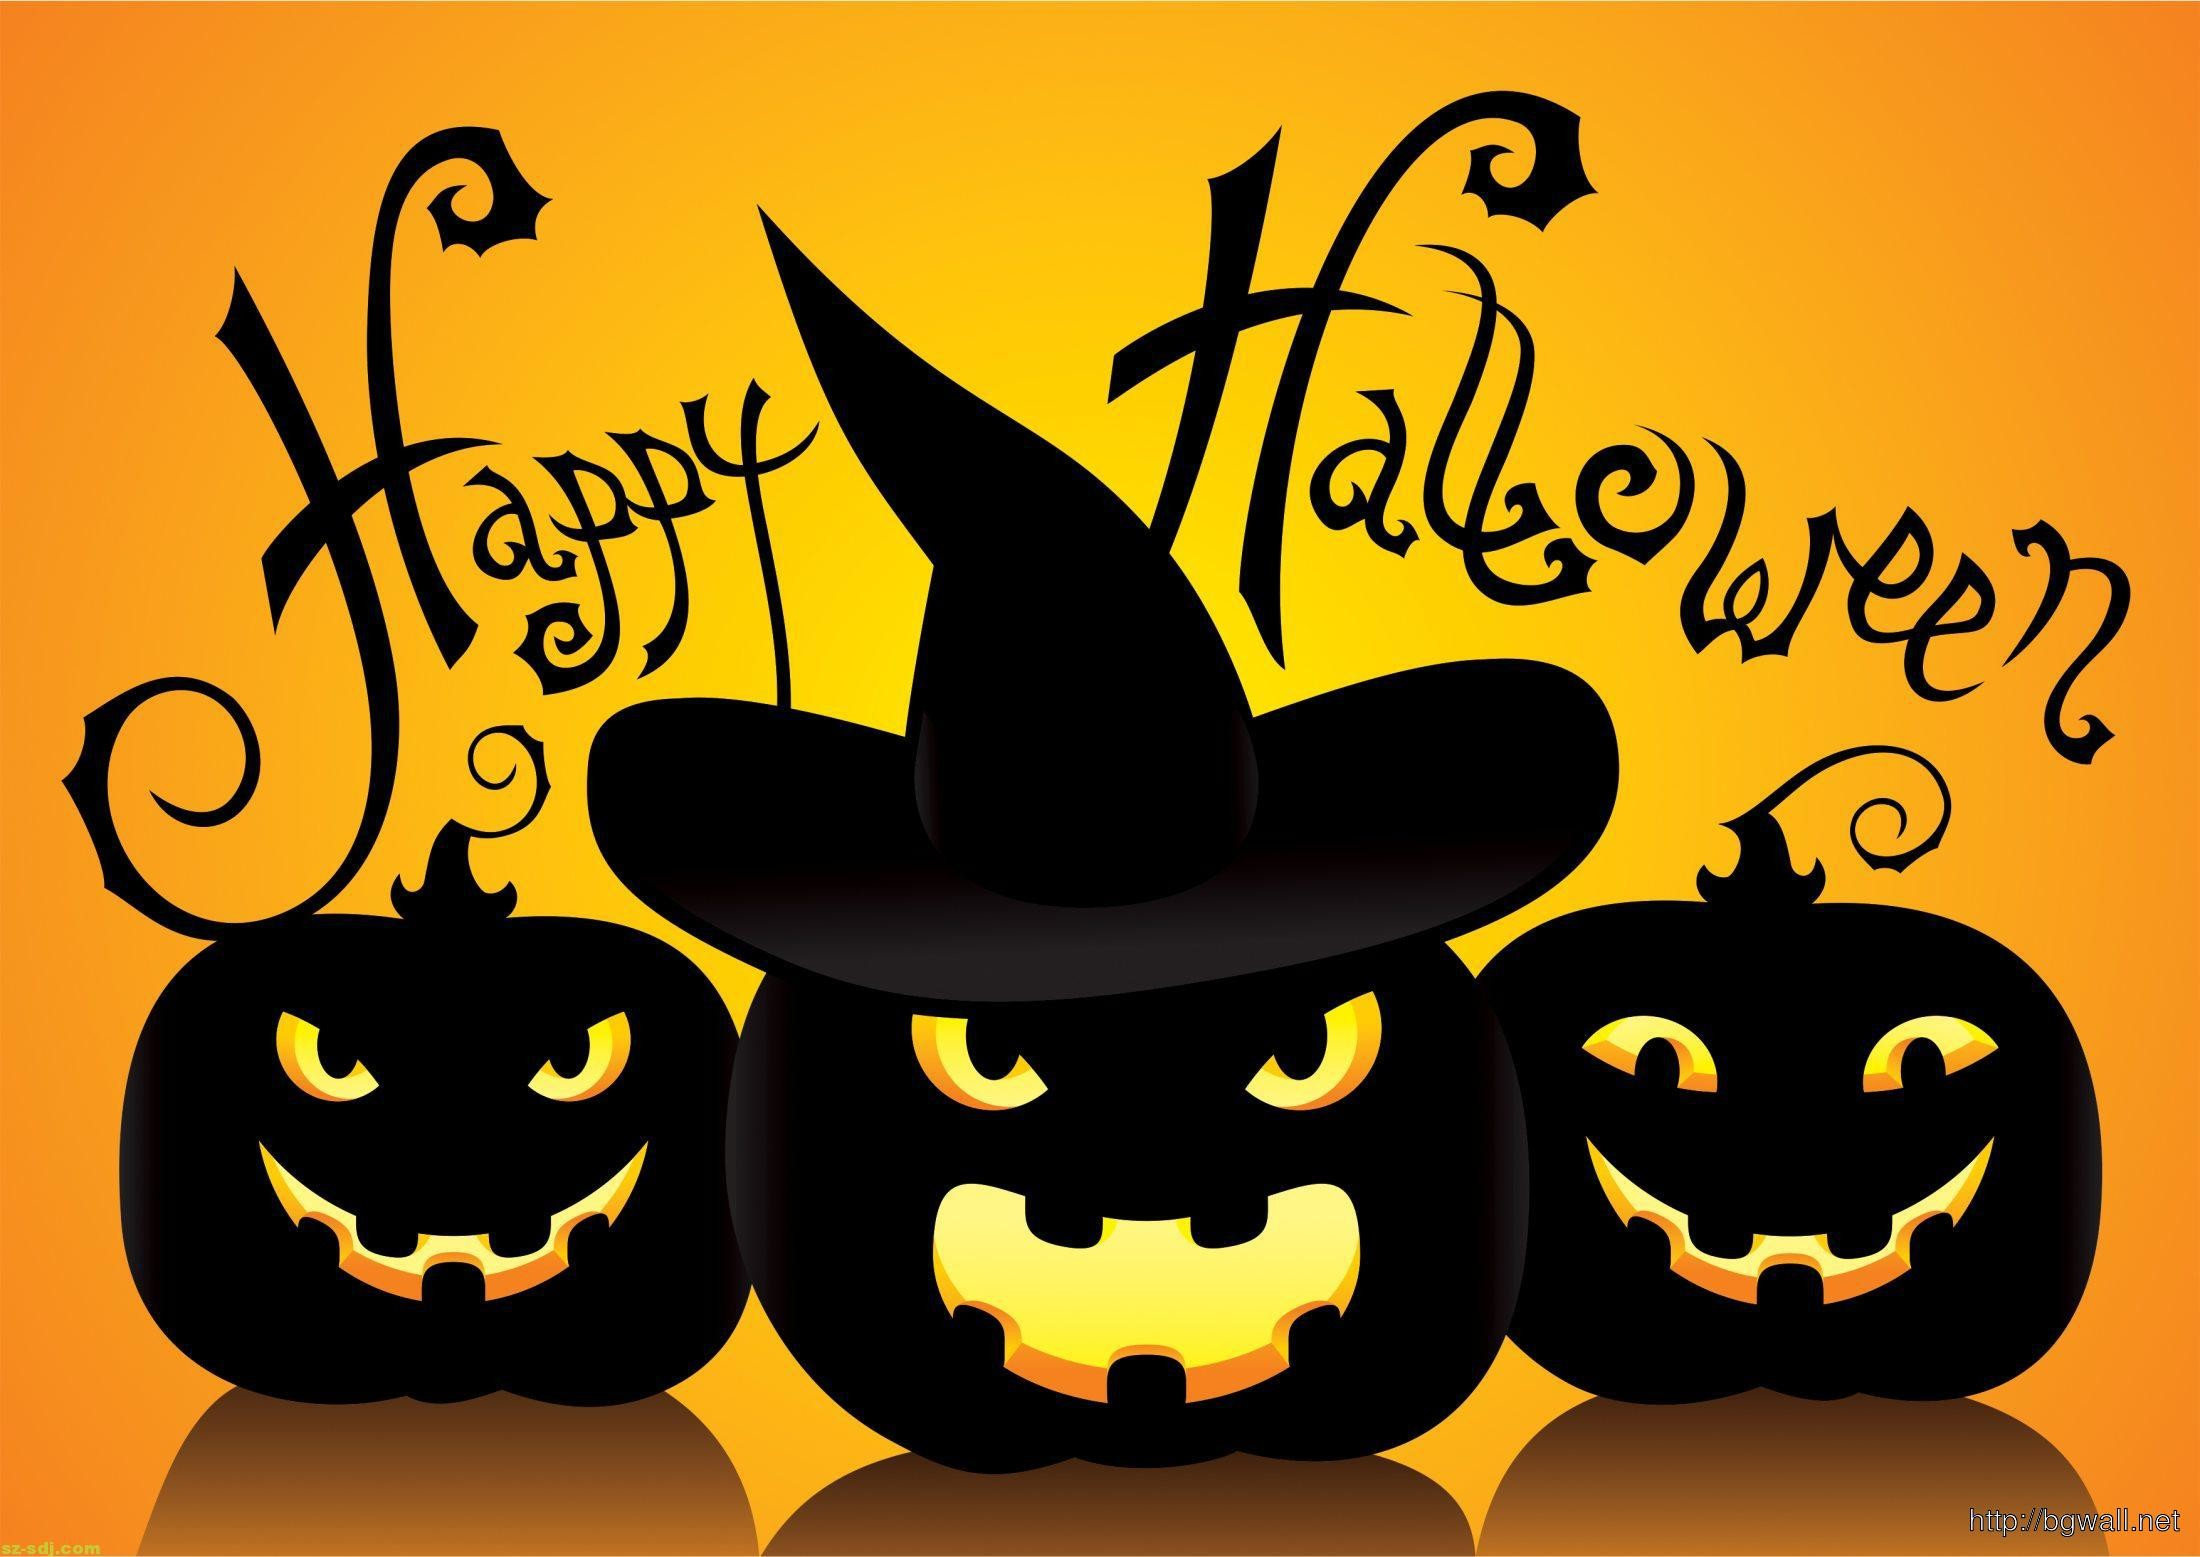 Happy Halloween from SIF – Summit International Flooring